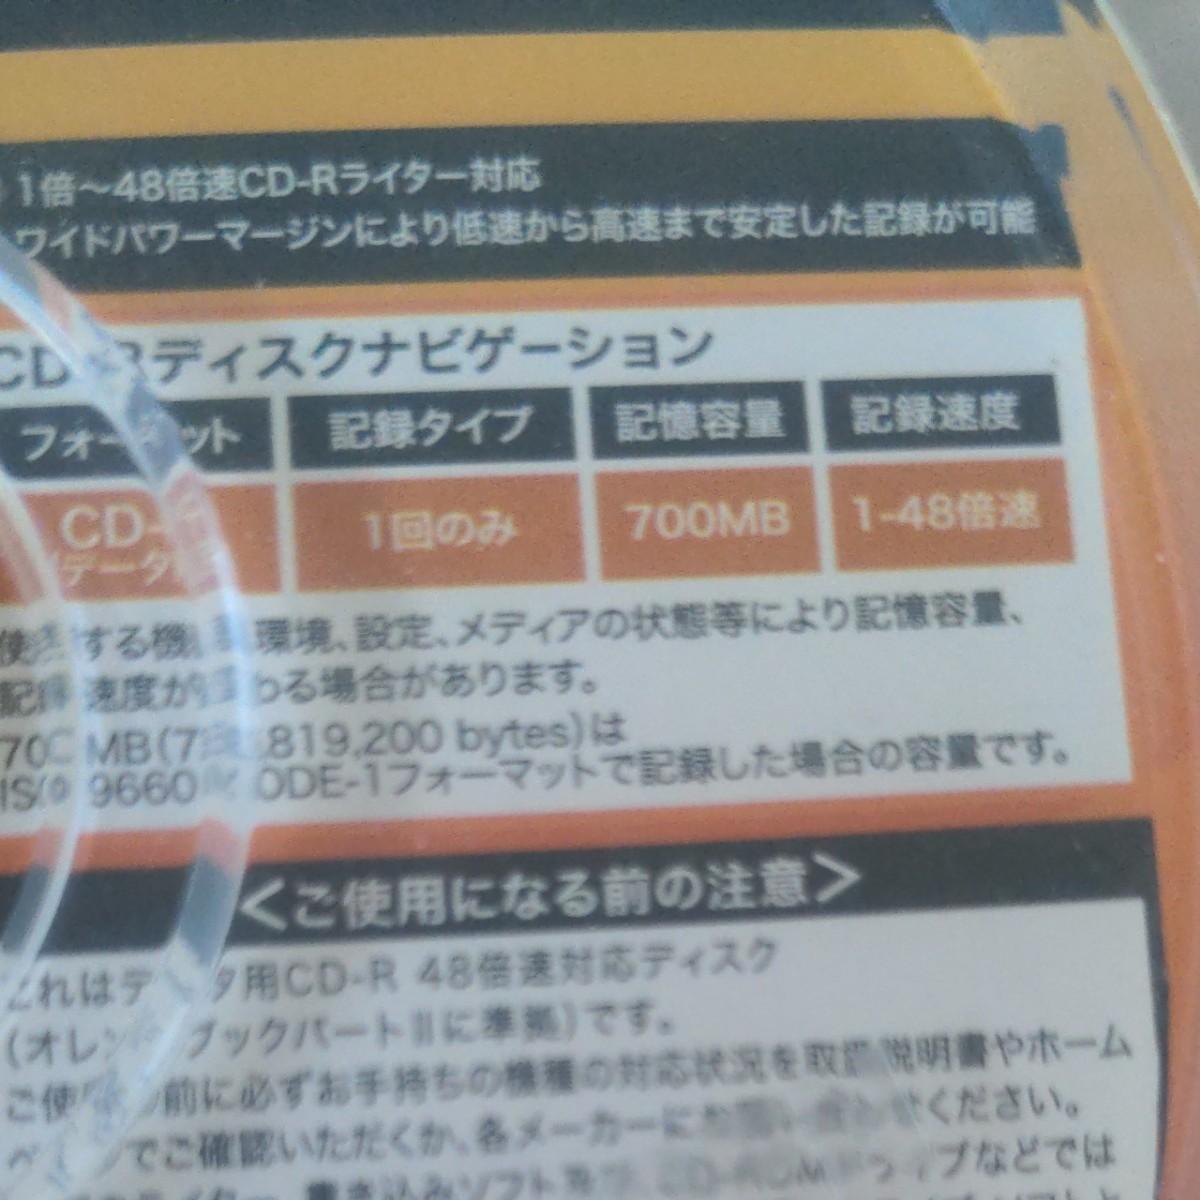 SONY CD-R データ用 9枚